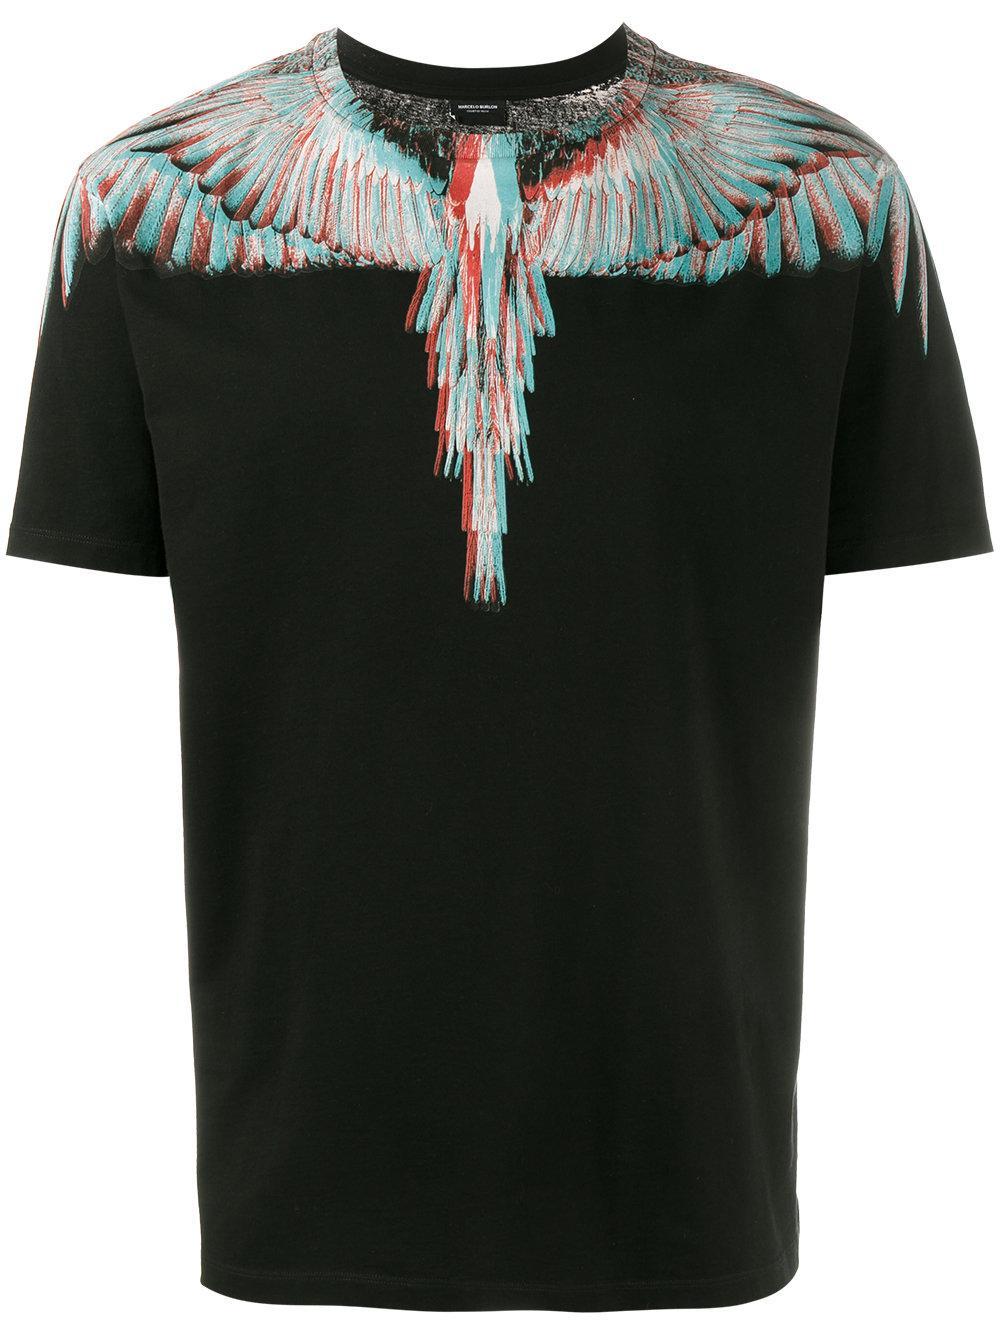 Marcelo burlon salvador printed t shirt in black for men for T shirt printing mobile al